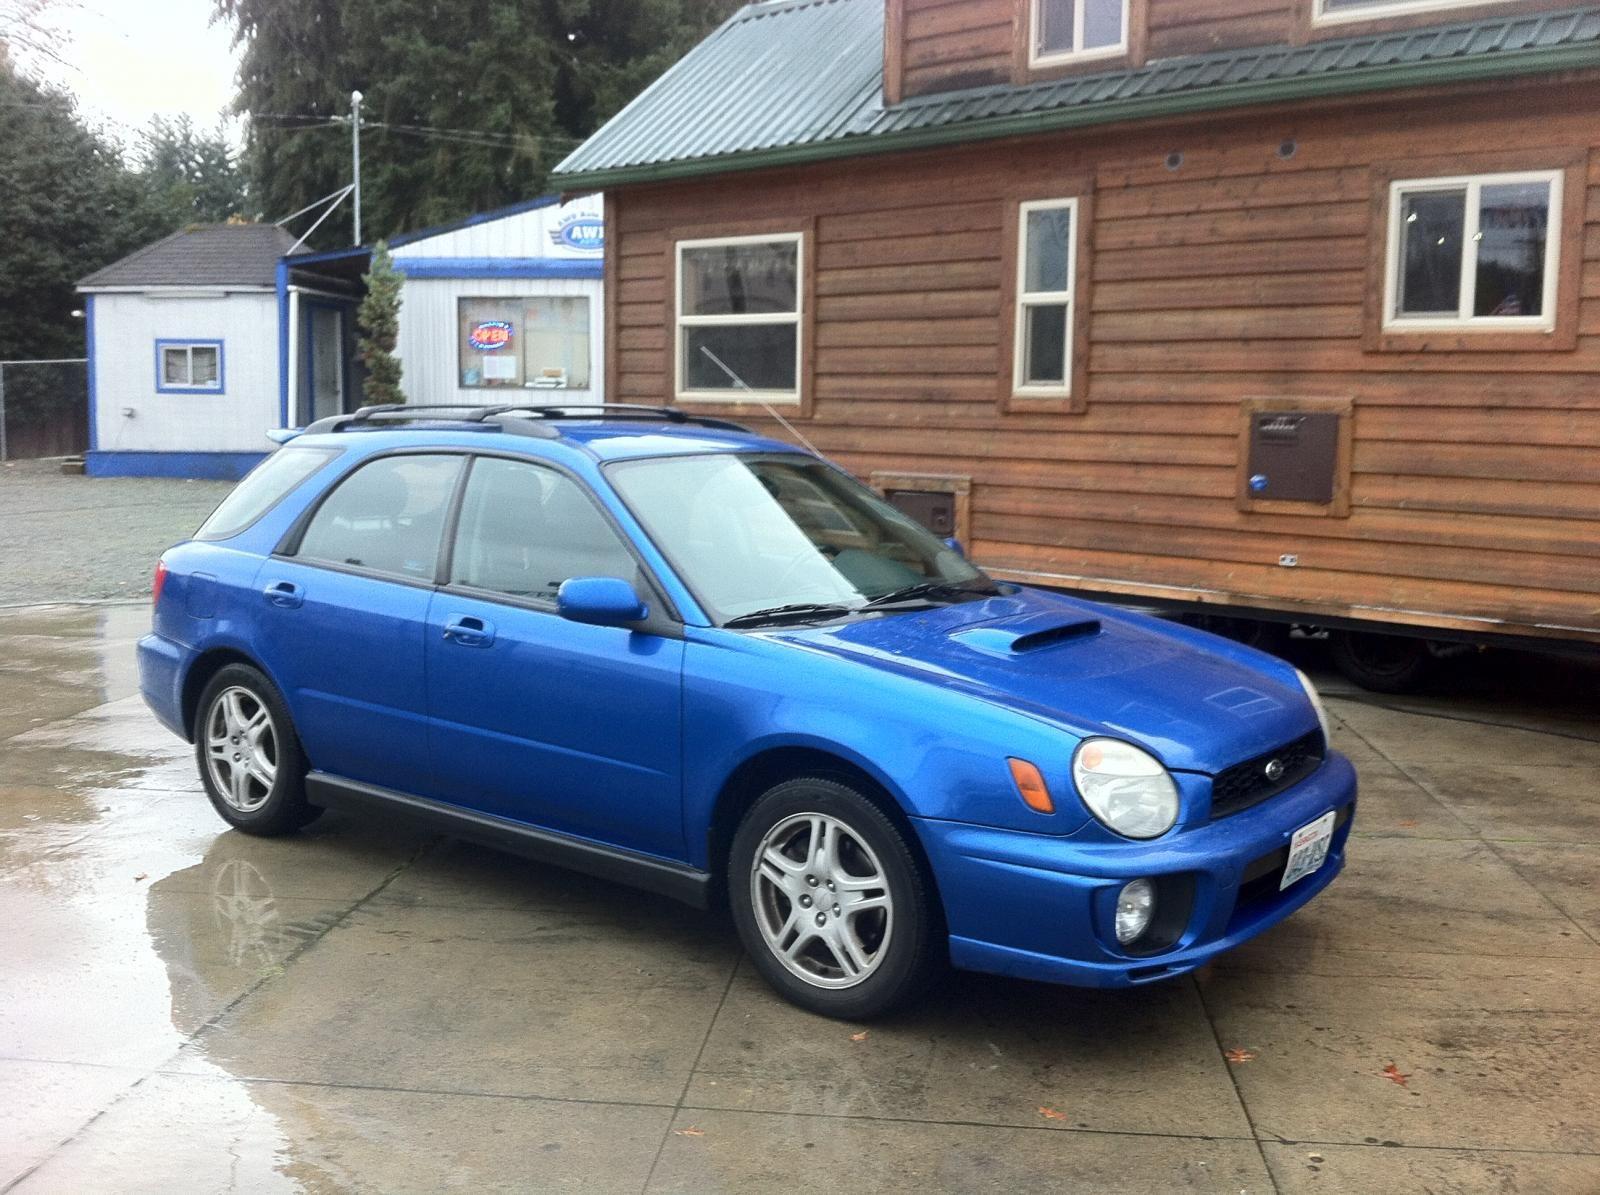 2002 Subaru Impreza Wrx Specs Colors 0 60 0 100 Quarter Mile Drag And Top Speed Review Mycarspecs United States Usa